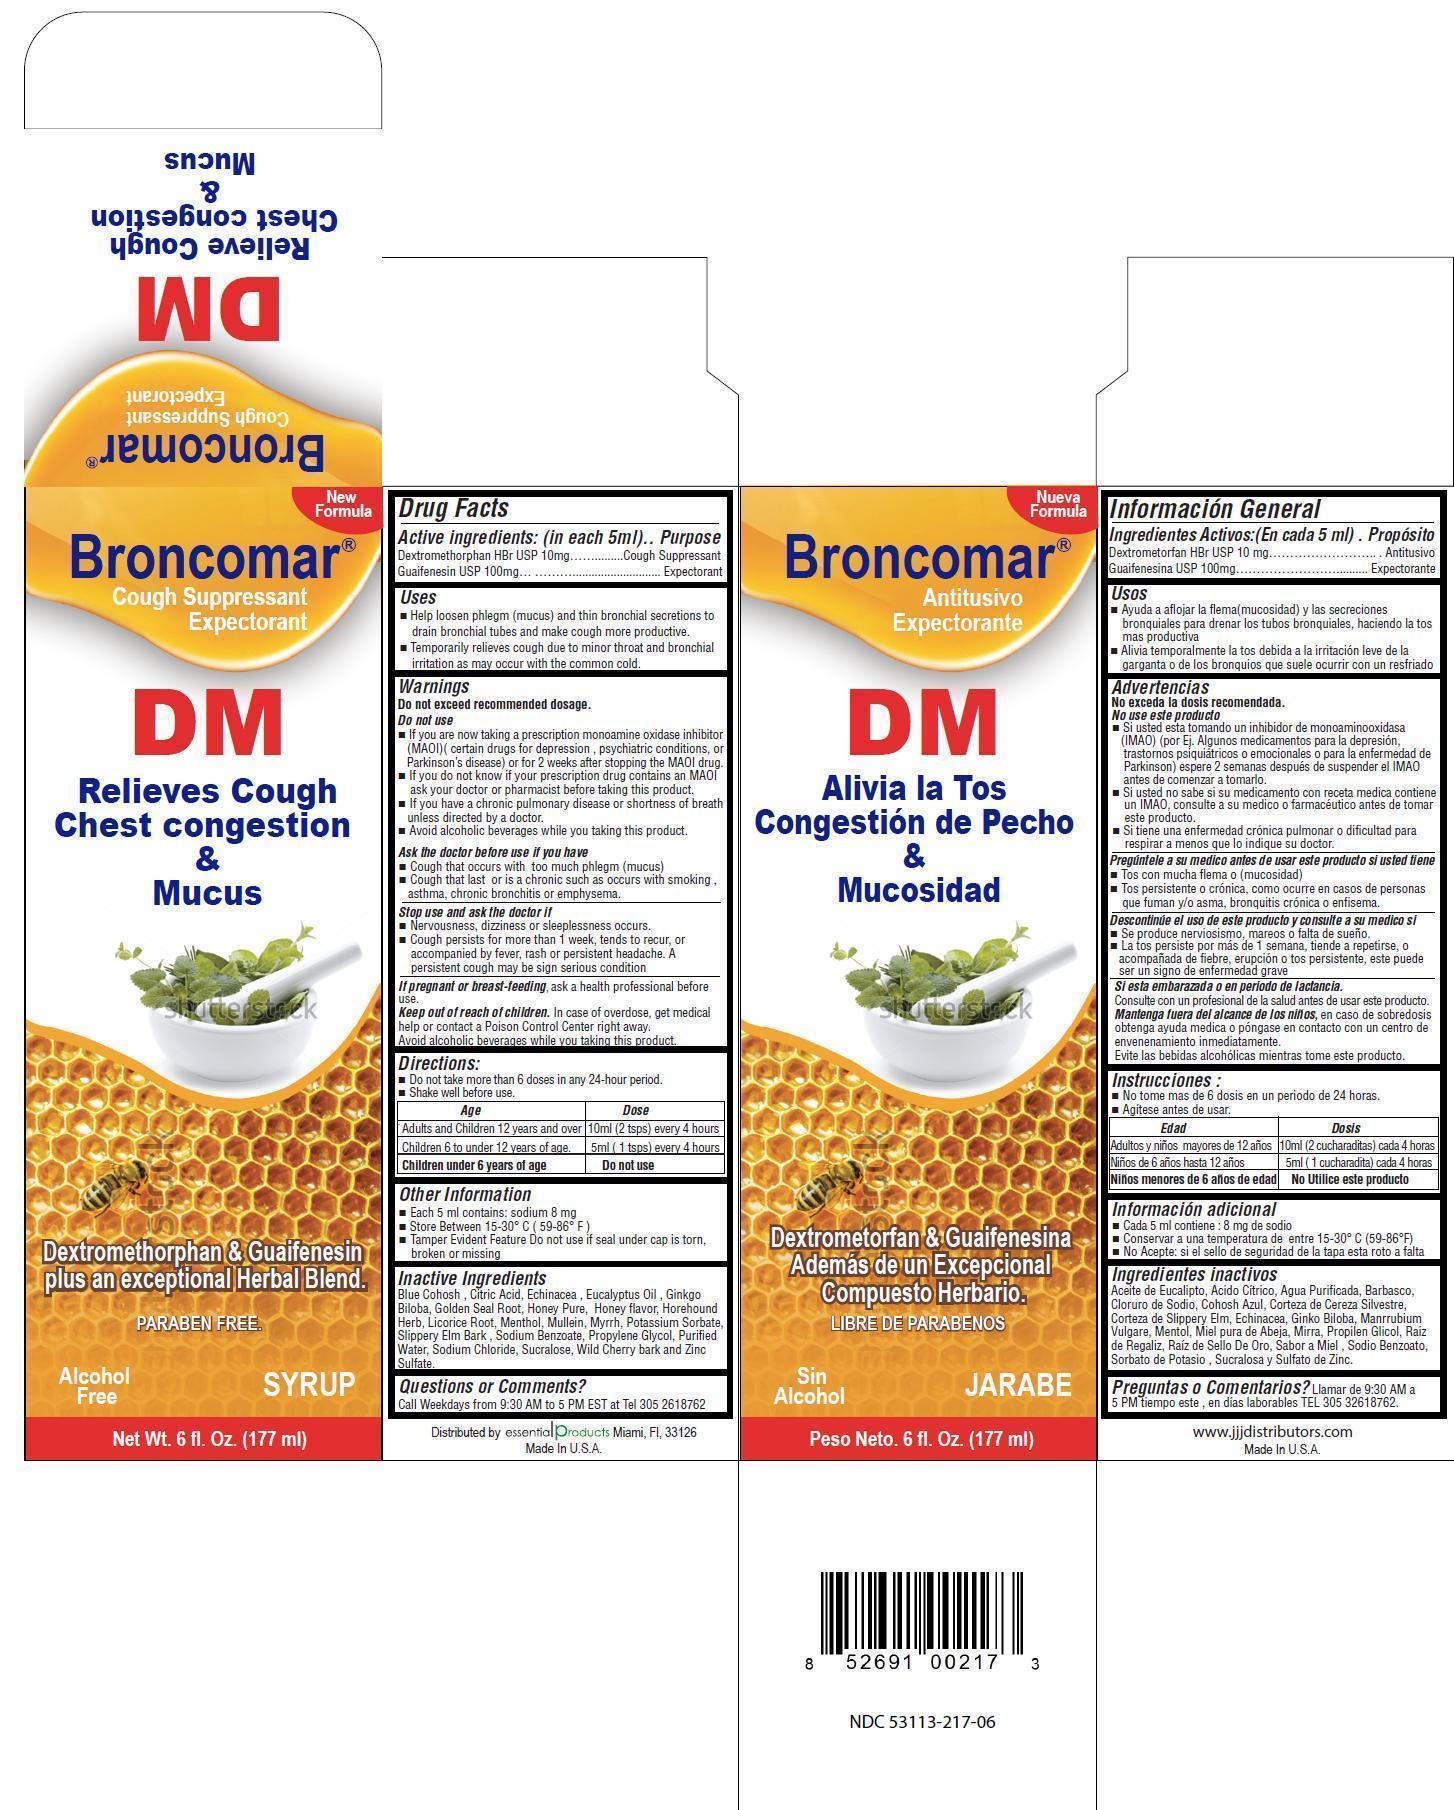 Broncomar Dm (Dextromethorphan Hbr, Guaifenesin) Liquid [Gadal Laboratories Inc]